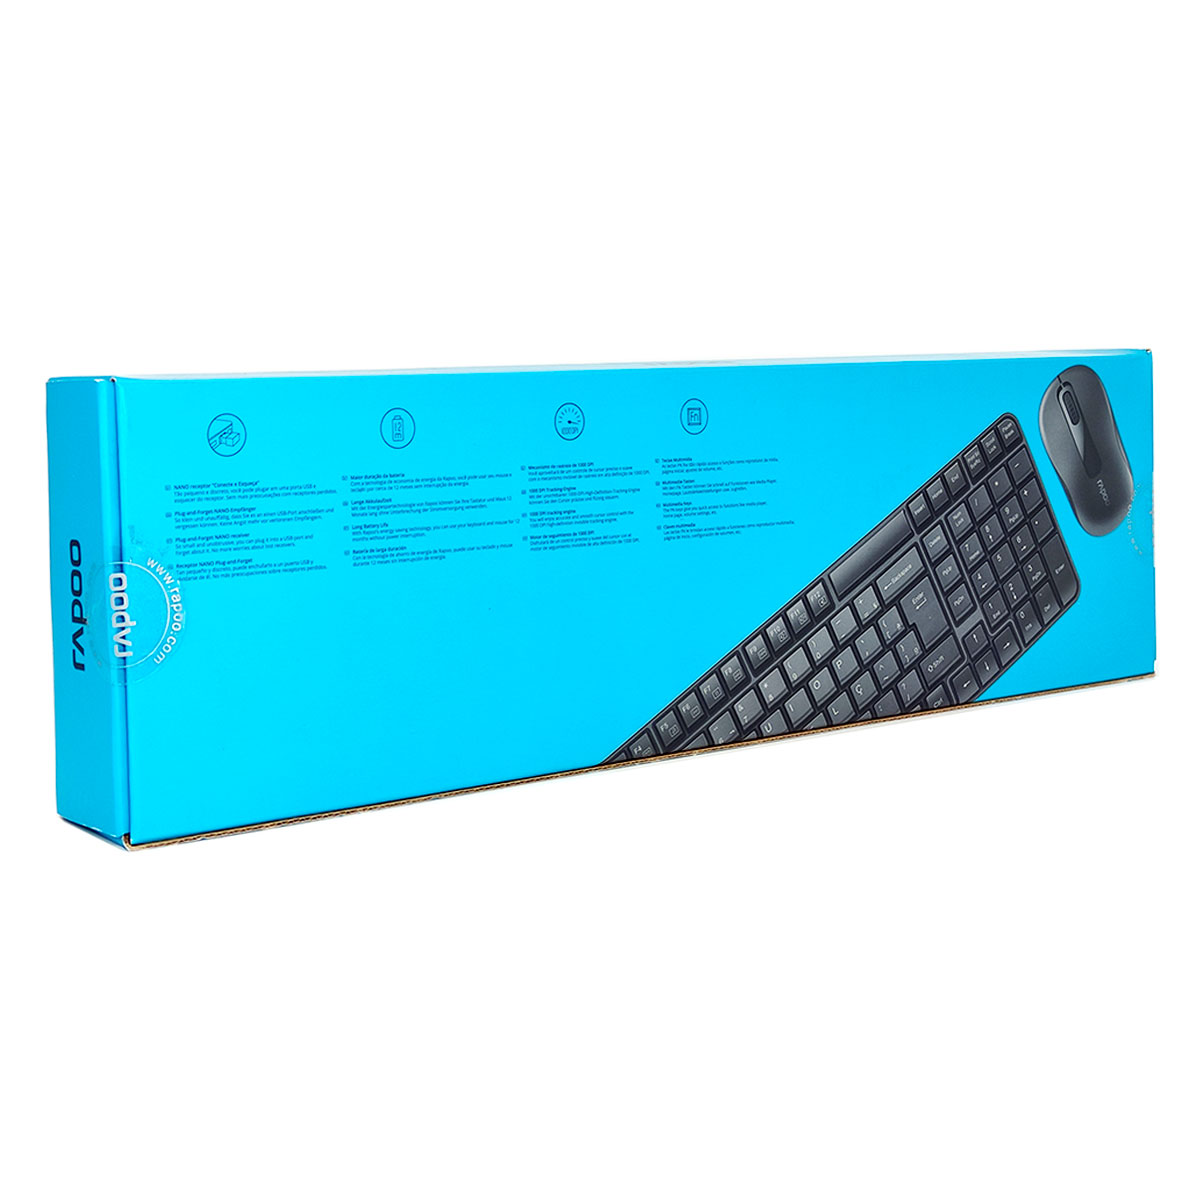 Kit Teclado e Mouse Rapoo X1800S, Wireless 2.4 GHz, ABNT2, 1000 DPI, Preto - RA001